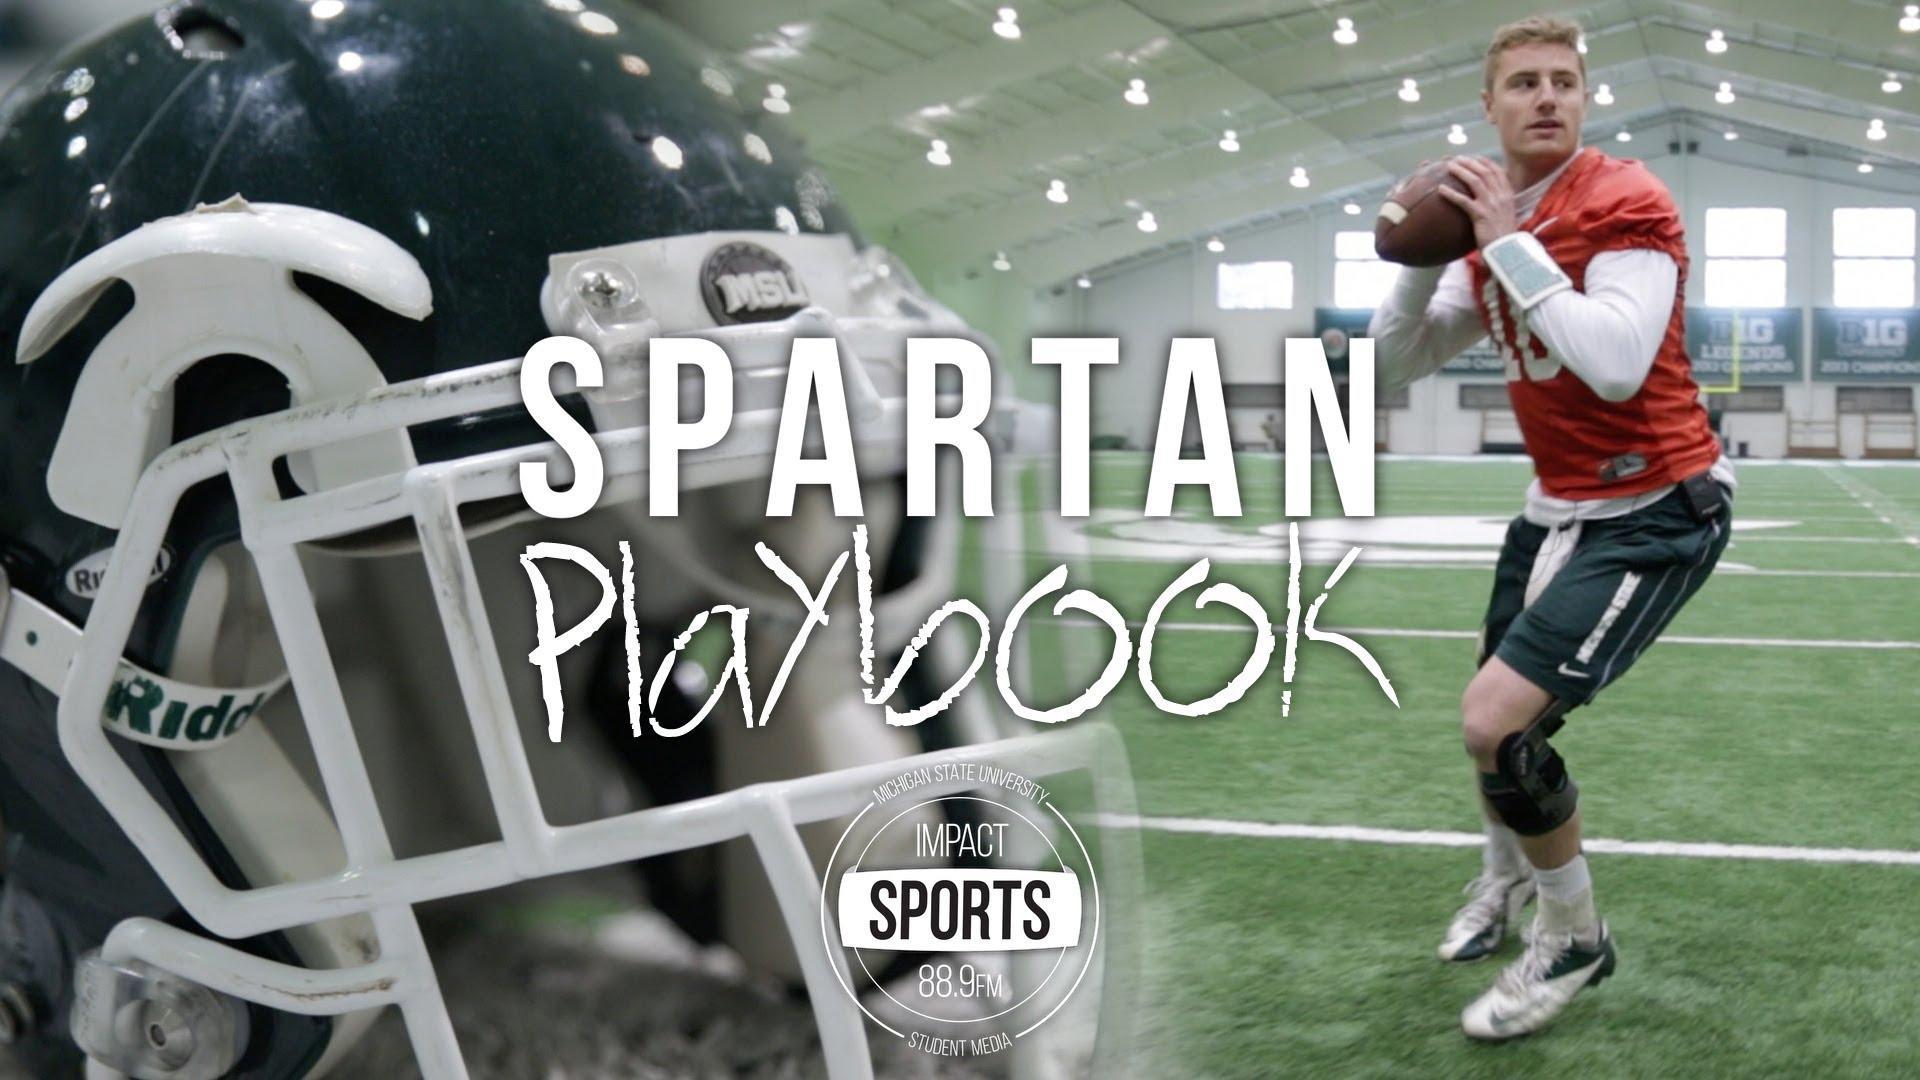 Spartan Playbook: Three-Step Drop - Connor Cook